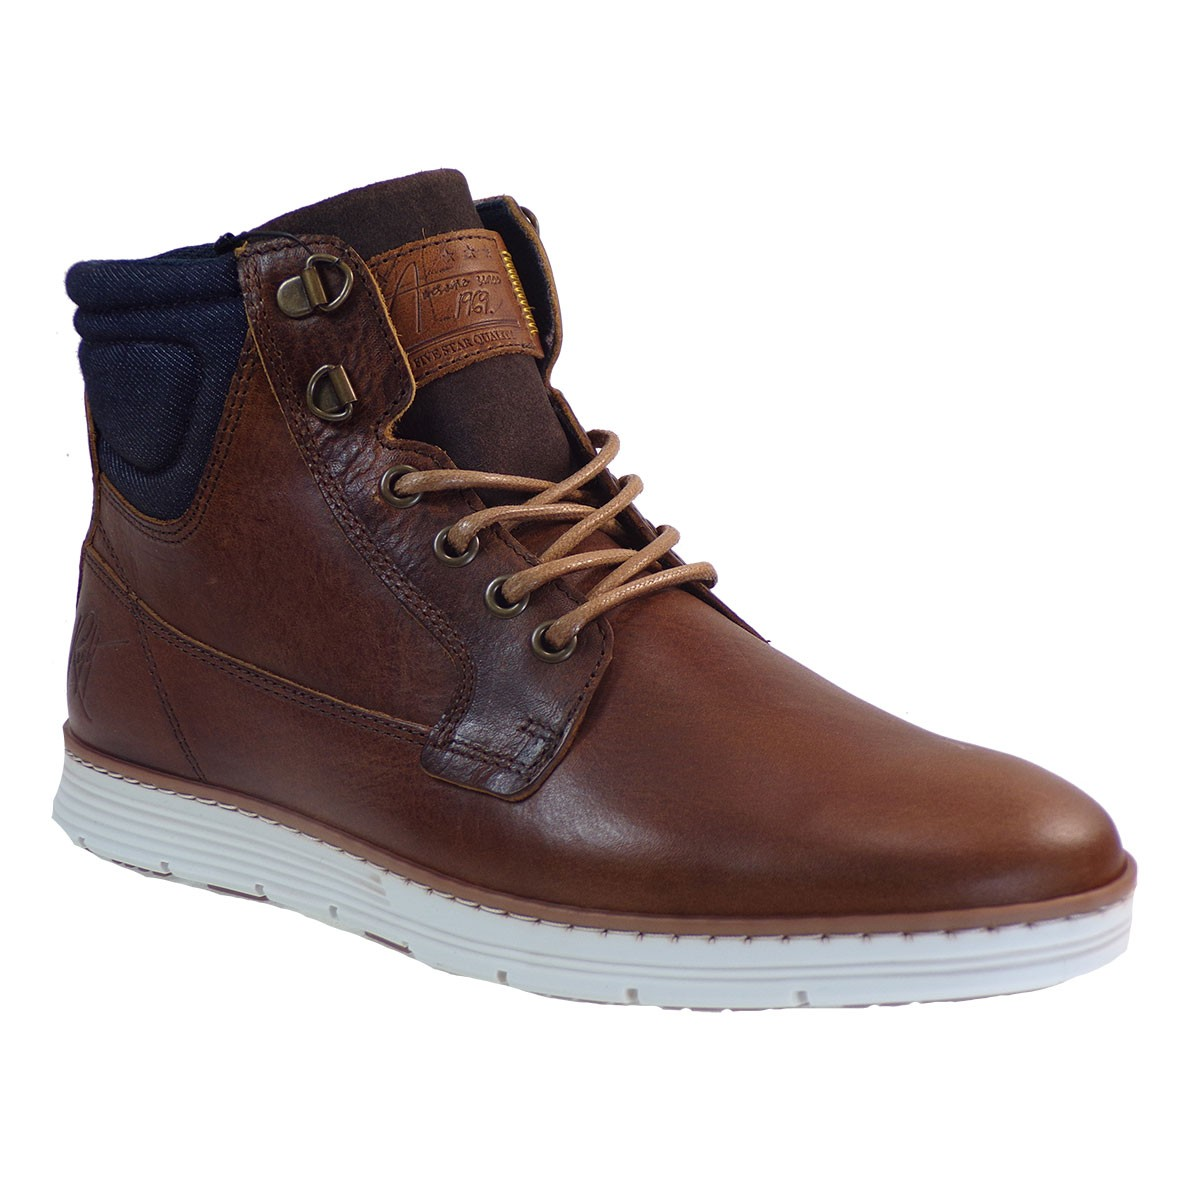 Bullboxer Ανδρικά Παπούτσια Mποτάκια 522-628Κ56522Α Tαμπά Δέρμα J57755222532